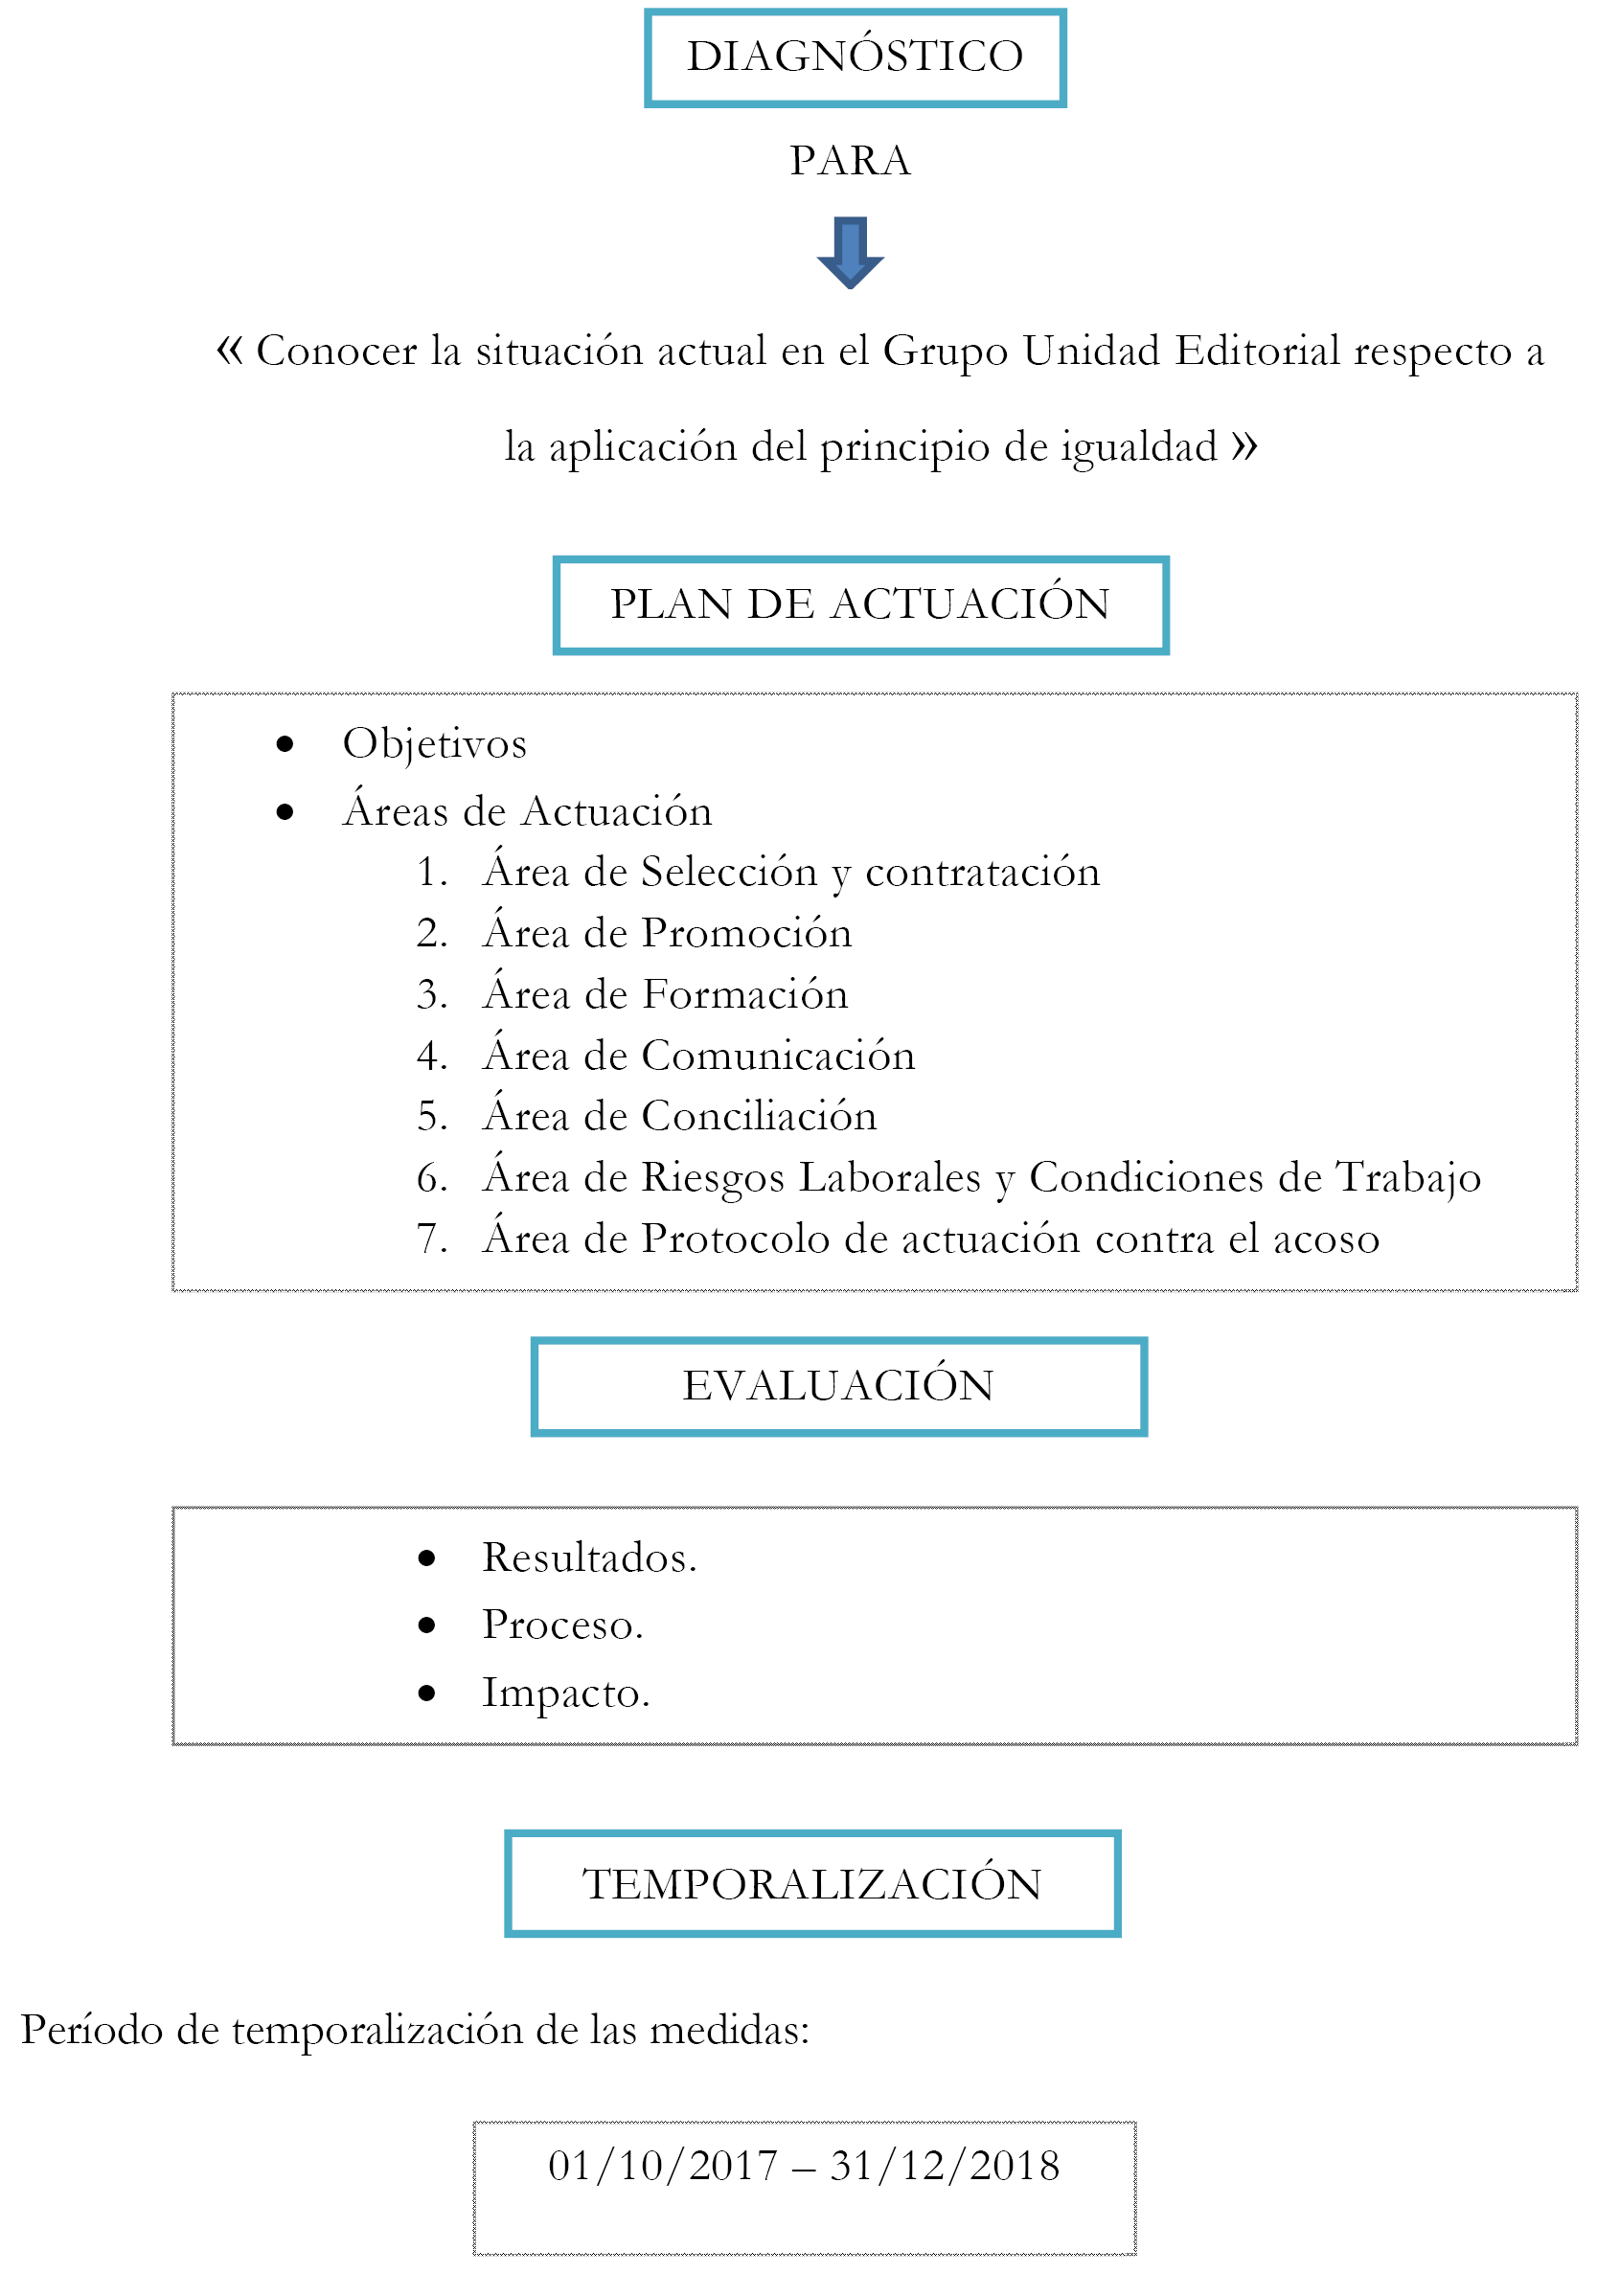 BOE.es - Documento BOE-A-2017-11521